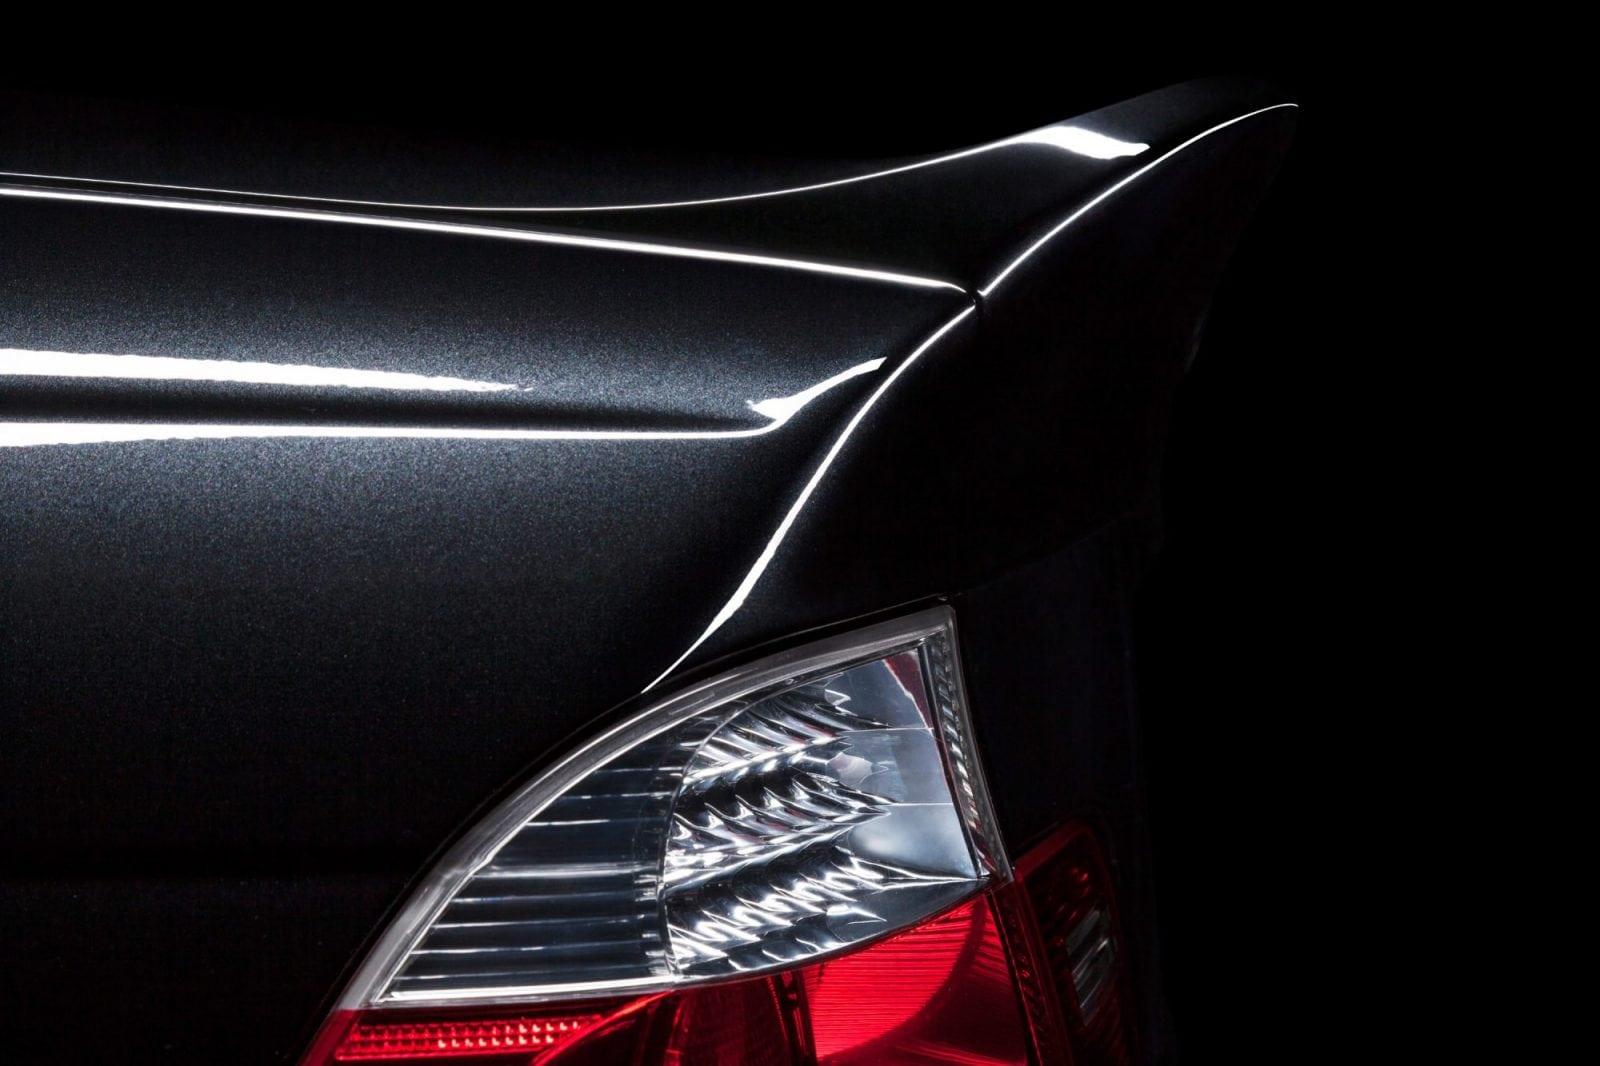 История BMW в фотографиях Оливера Солда. 1998–2001: Z3 Coupe; M3 CSL; Z8; X Coupe Concept Car